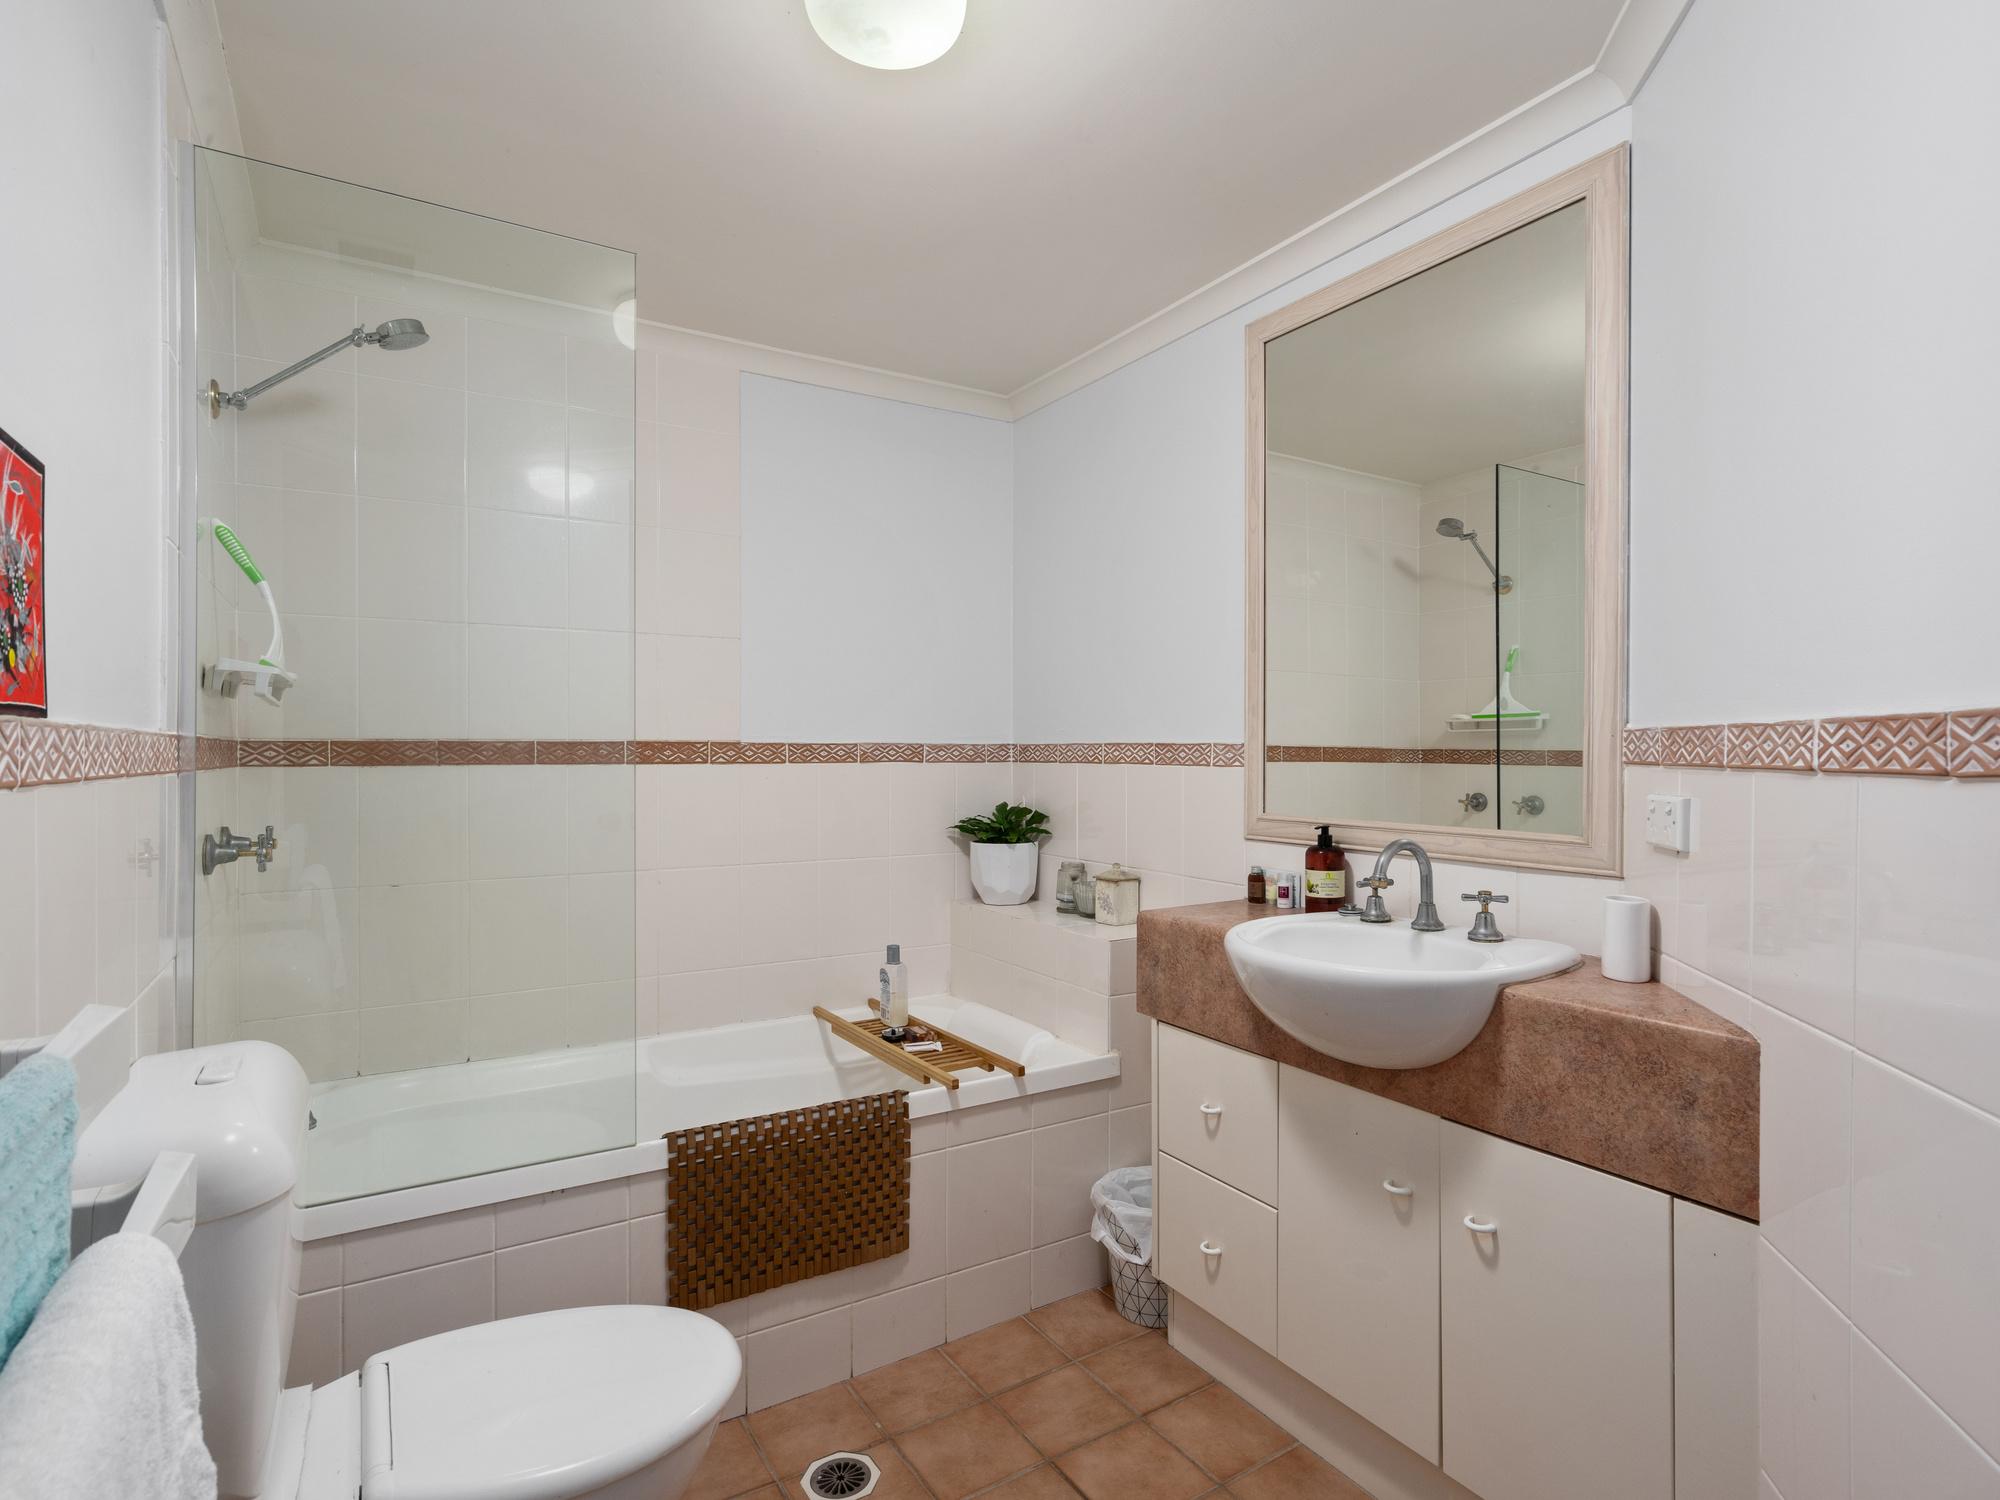 Real Estate | Gold Coast | Chevron Realty | 009 Open2view Id683962 3 10 16 Tarcoola Cresebt